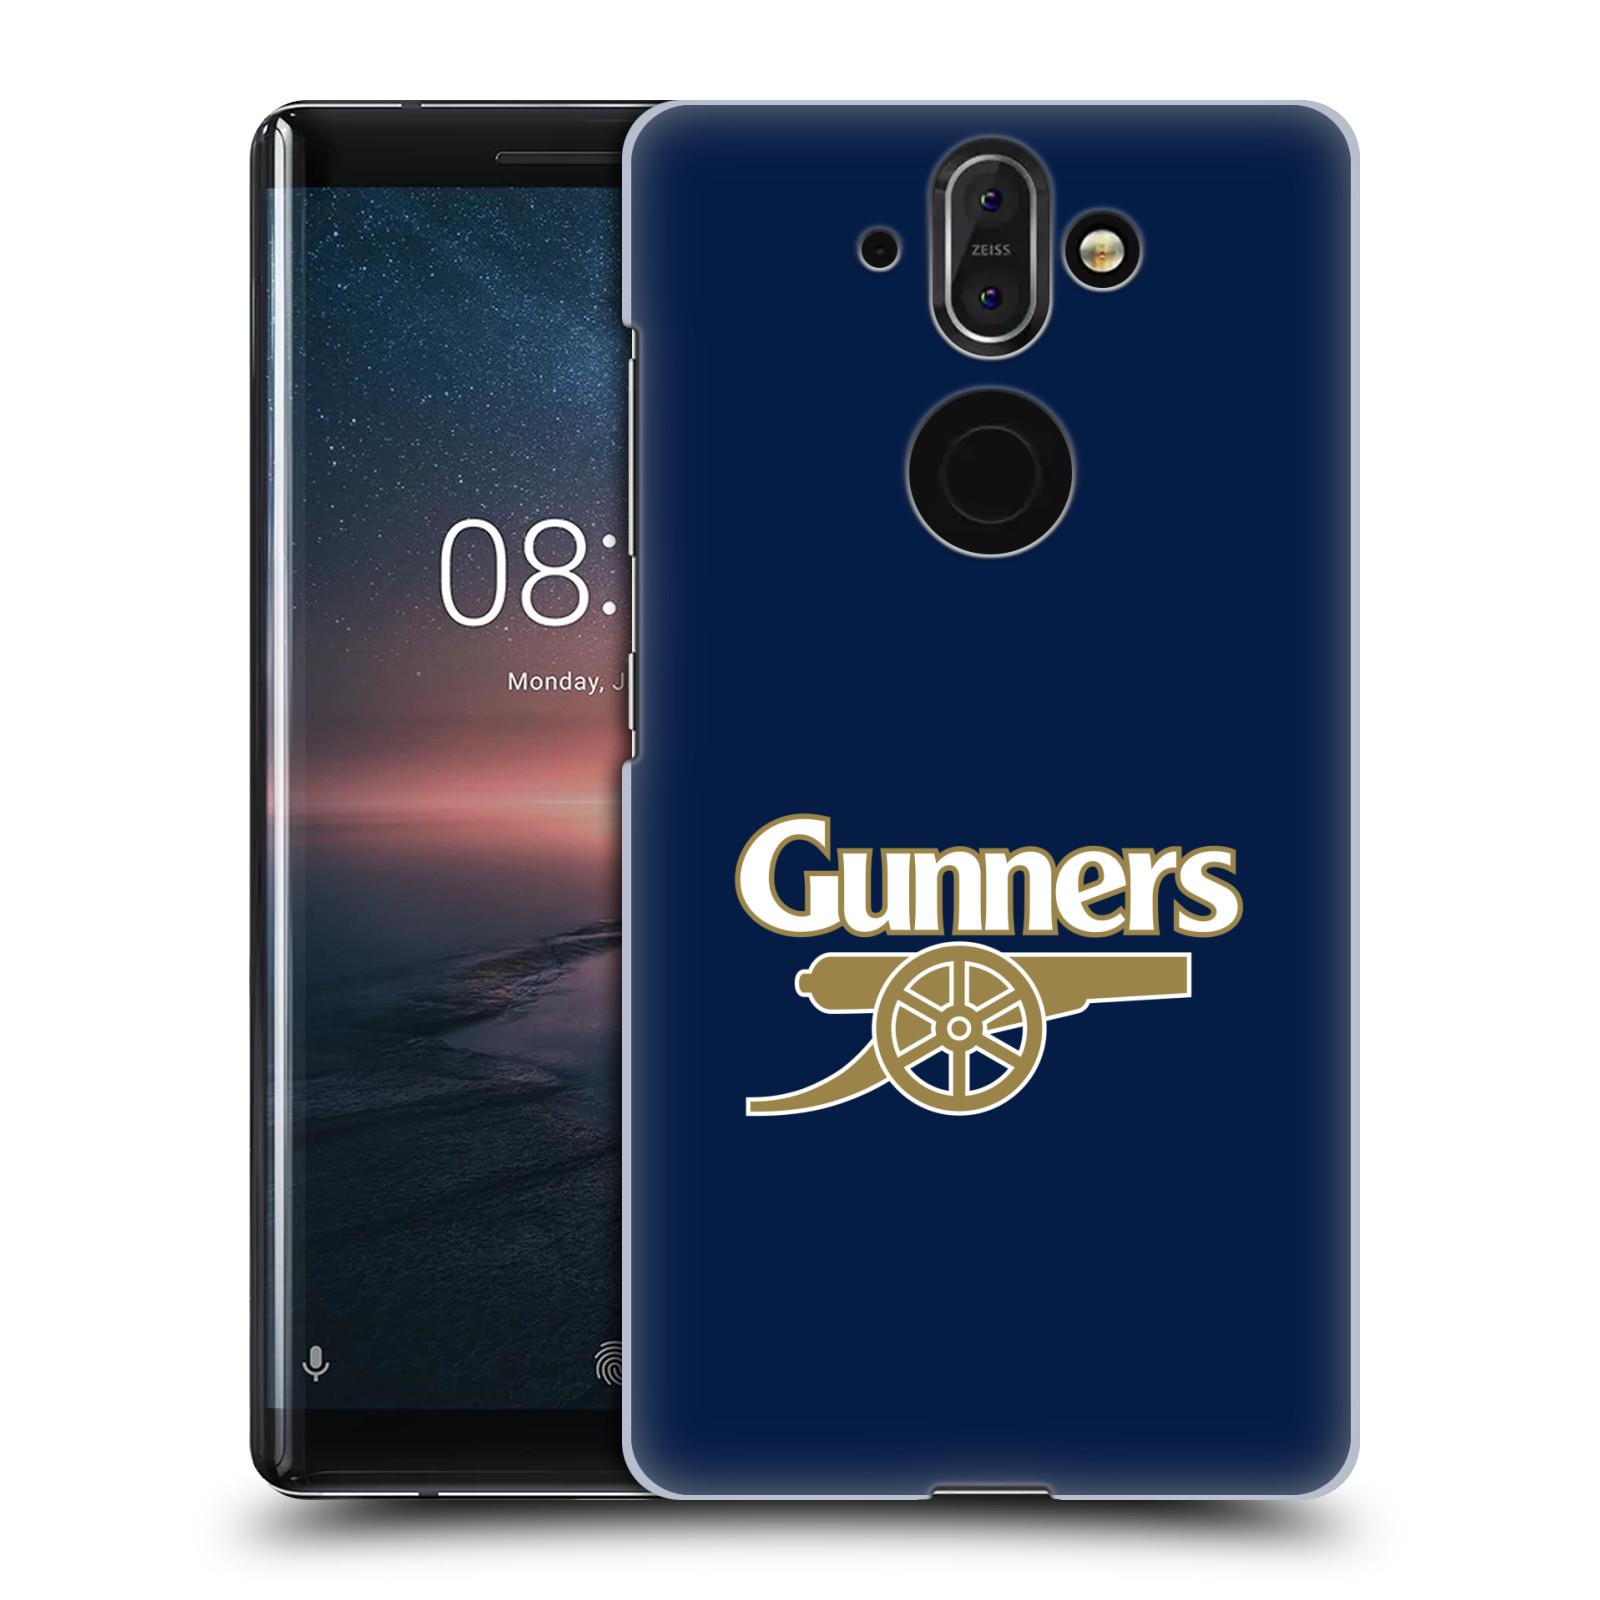 Plastové pouzdro na mobil Nokia 8 Sirocco - Head Case - Arsenal FC - Gunners